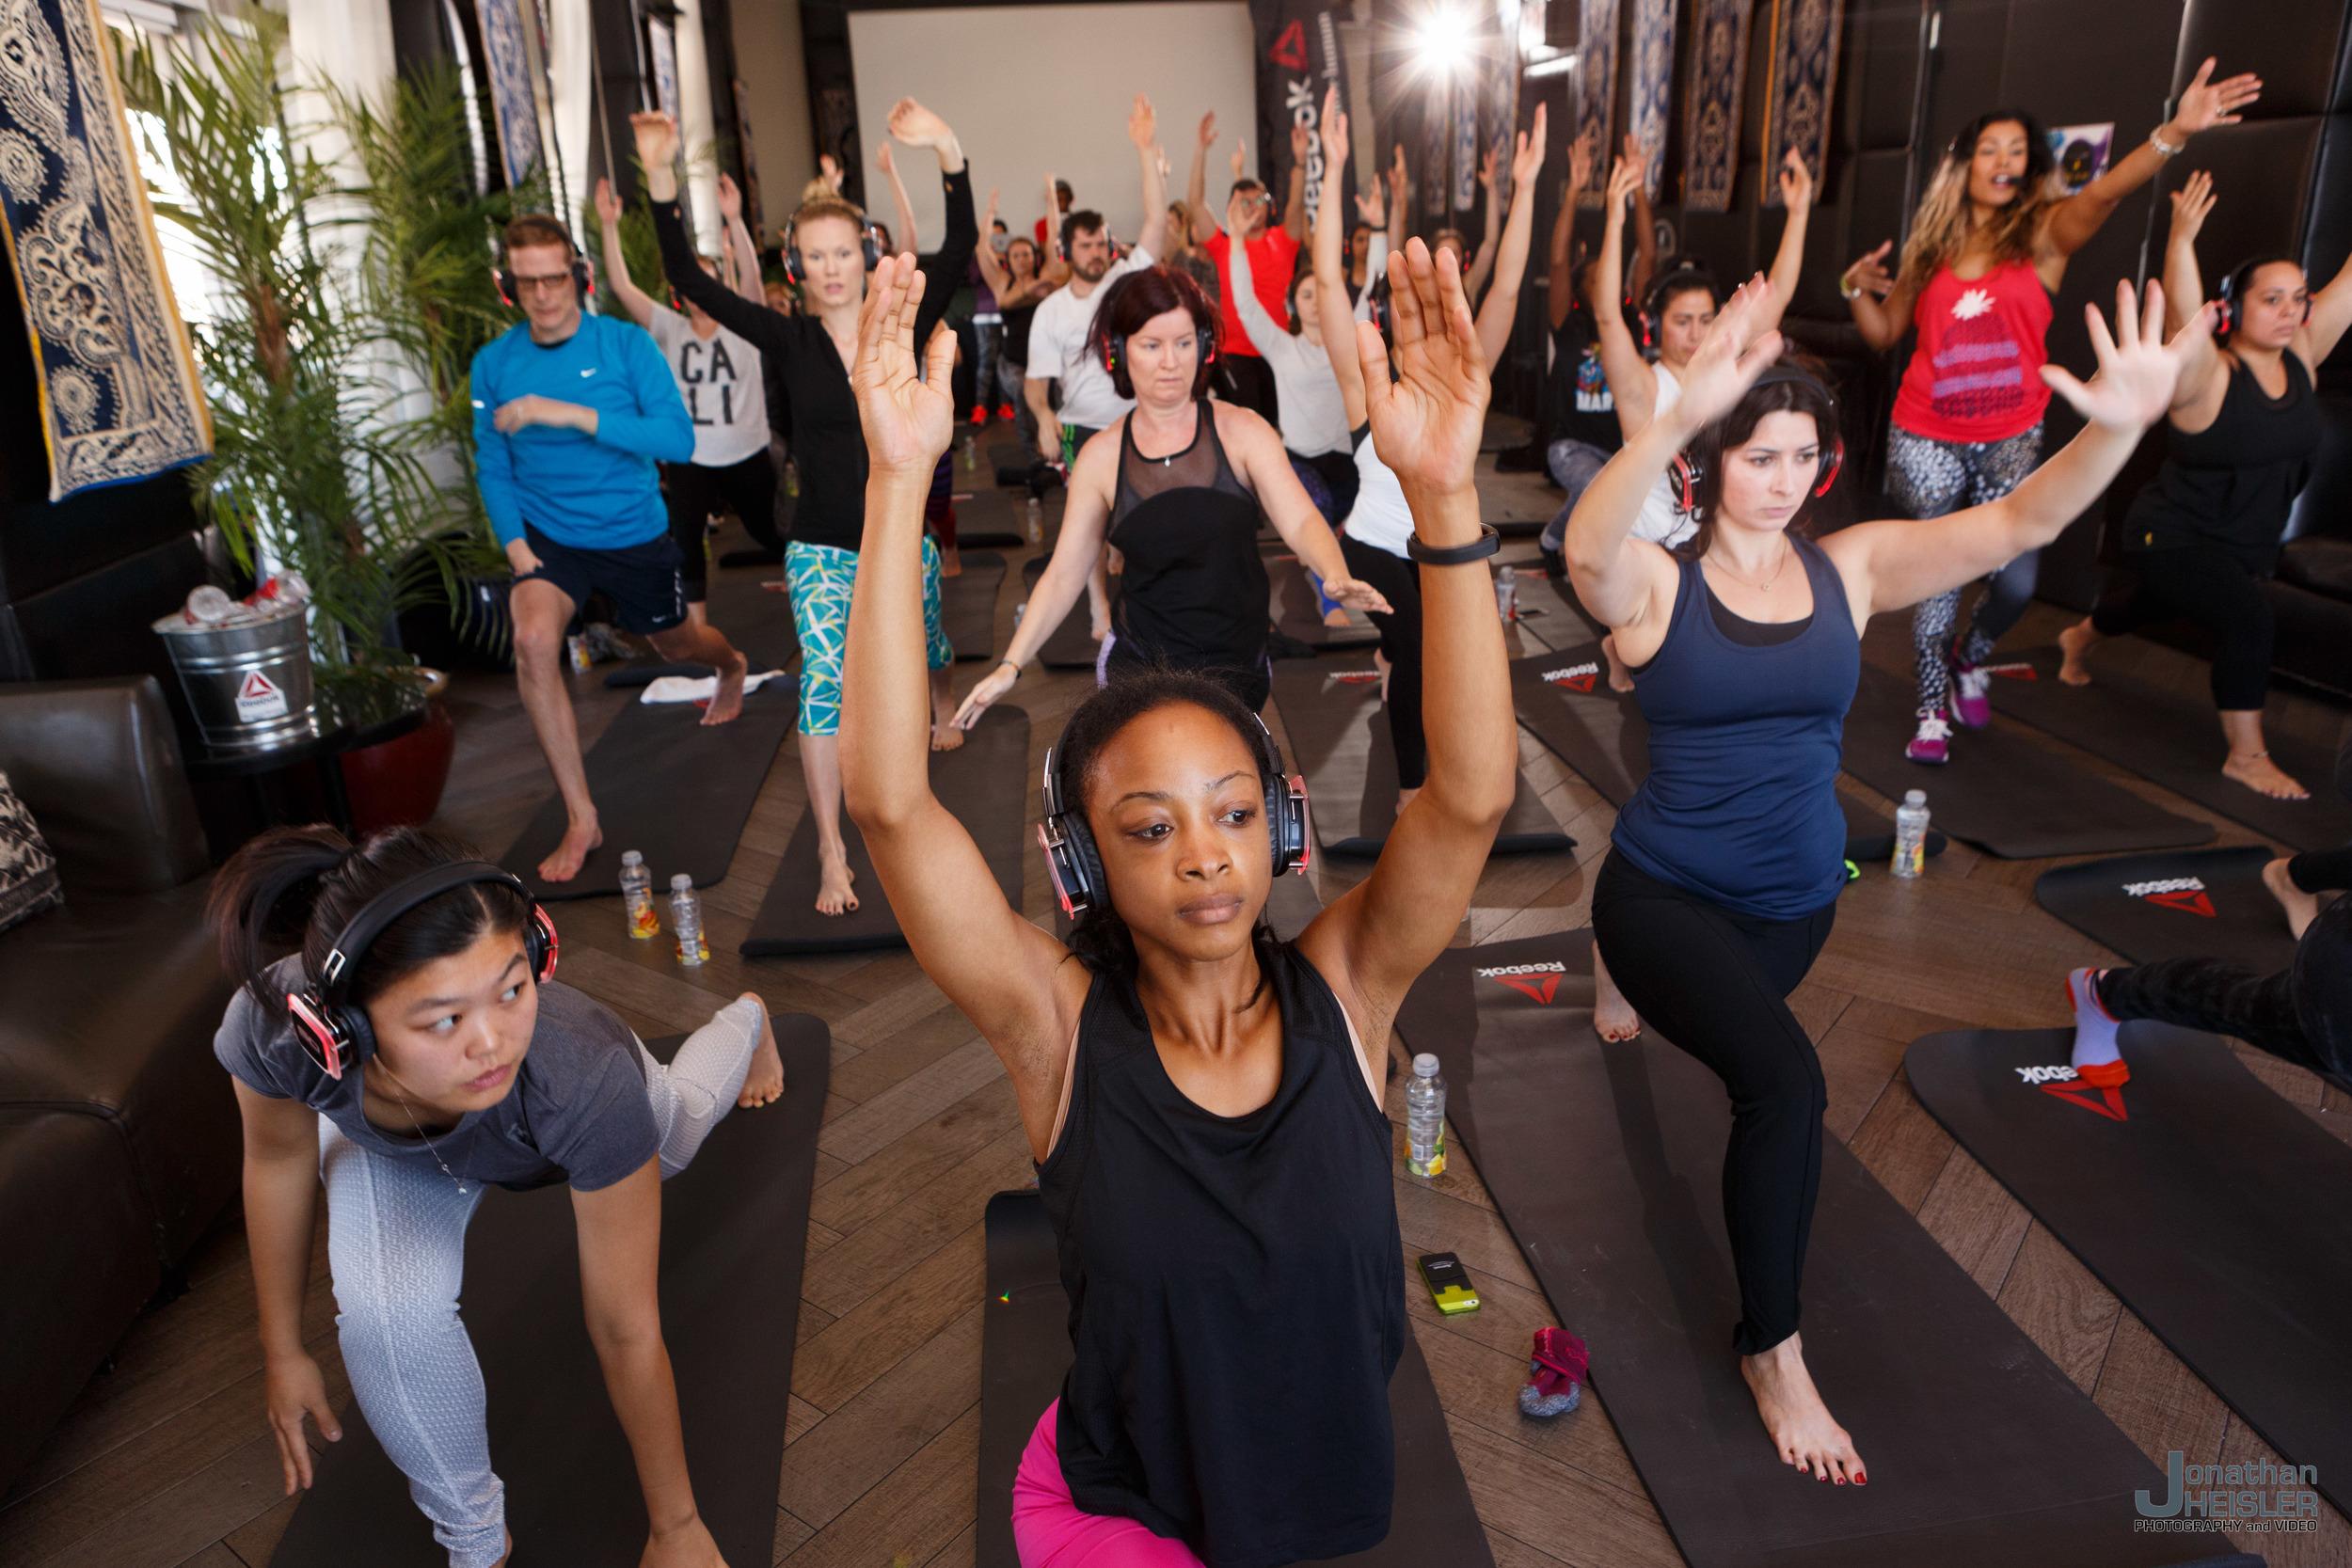 Reebok NYC Yoga_ Gansevoort Hotel NYC __  Jonathan Heisler _ 11.21.2015_008f_5.6.jpg